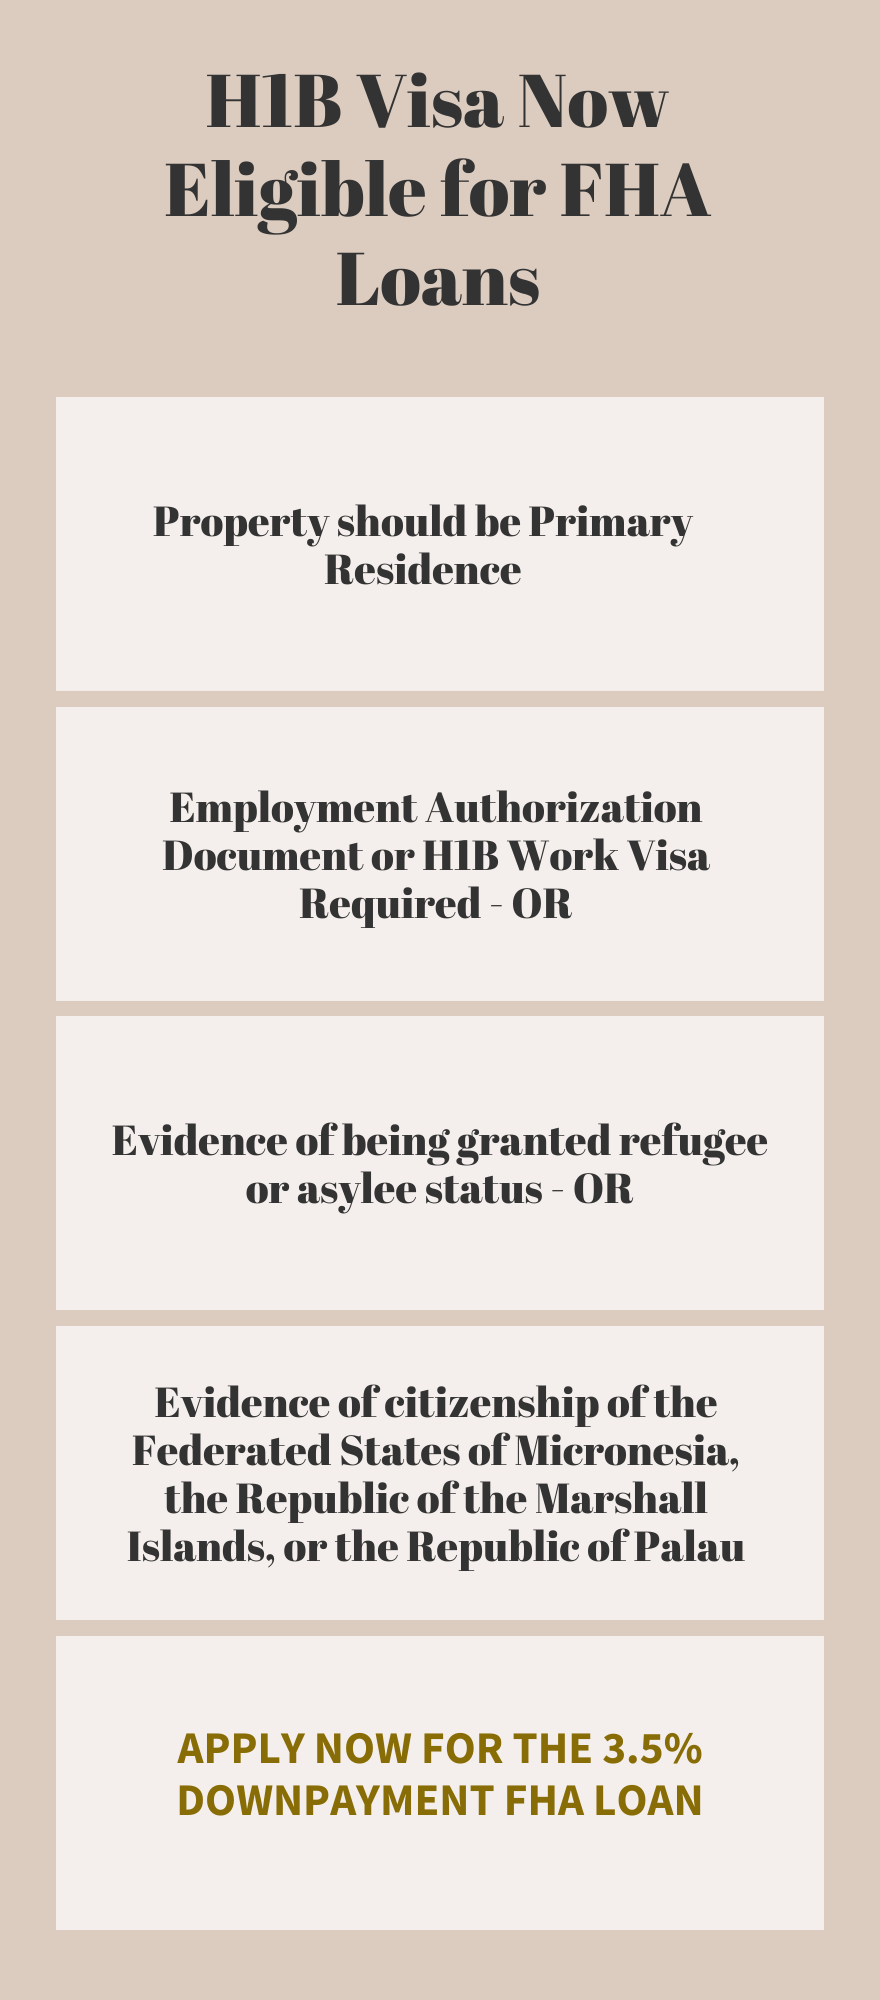 H1B Visa Eligible for FHA loans